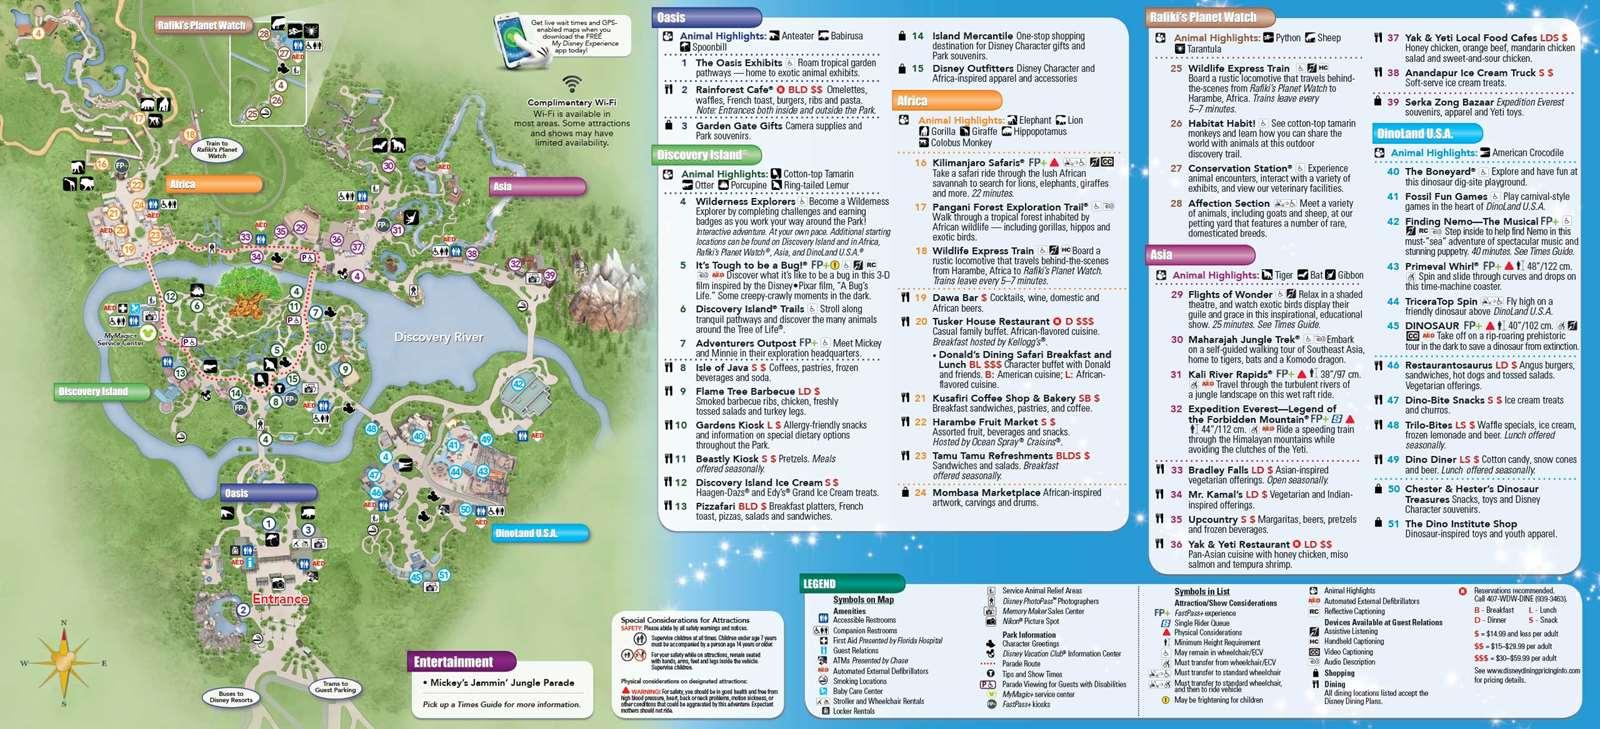 2014 Walt Disney World Park Maps With Fastpass Photo 2 Of 8